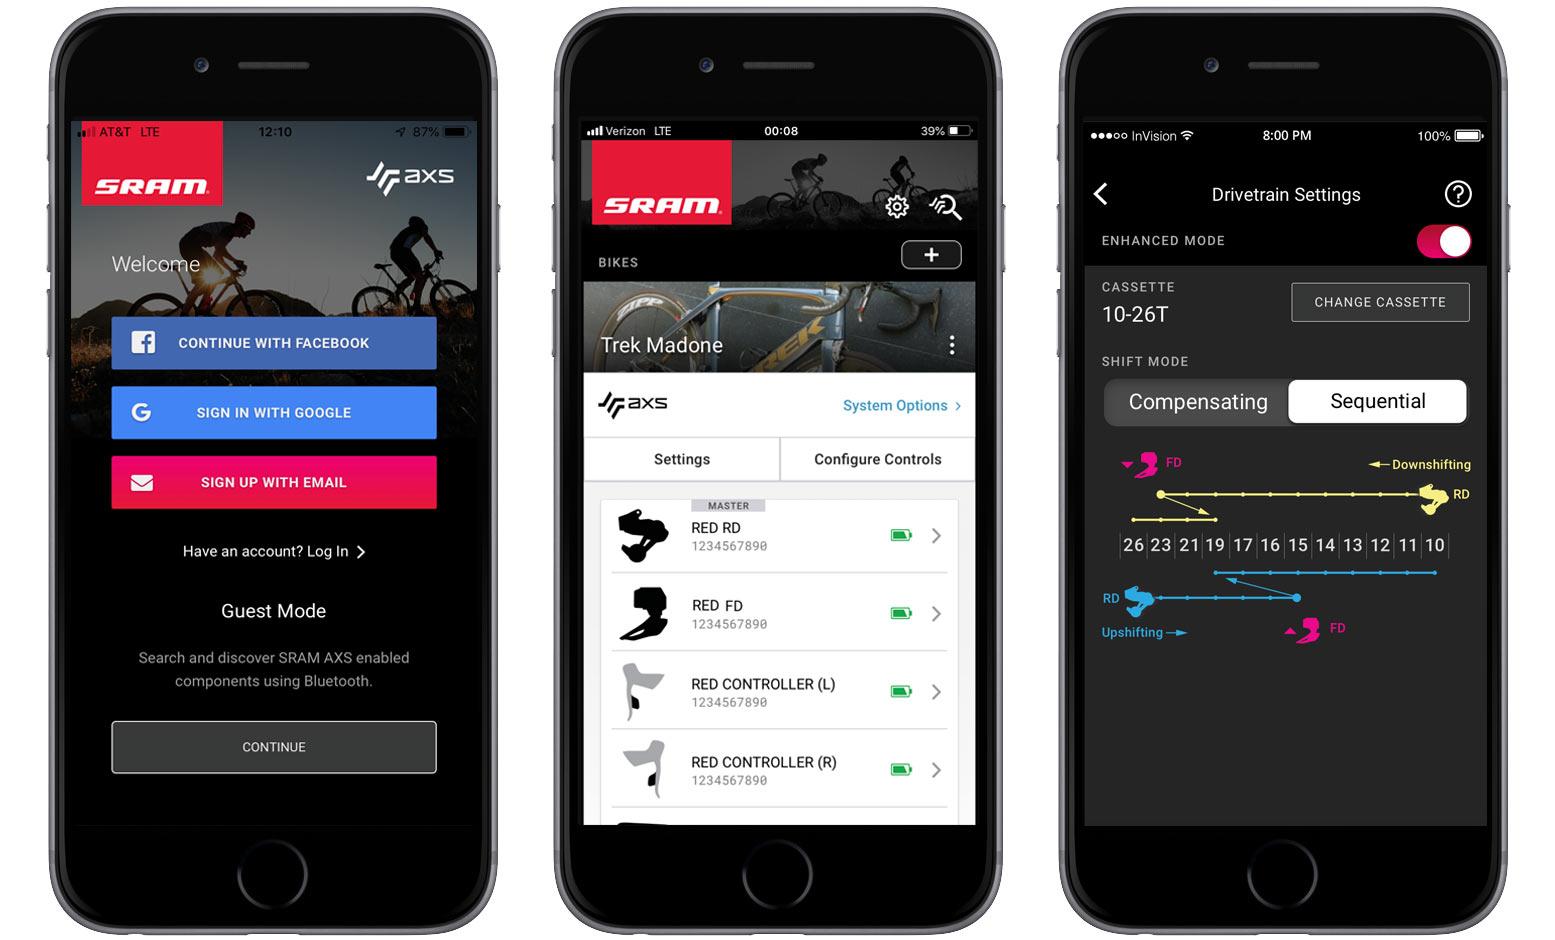 sram, axs, bike, app, configurator